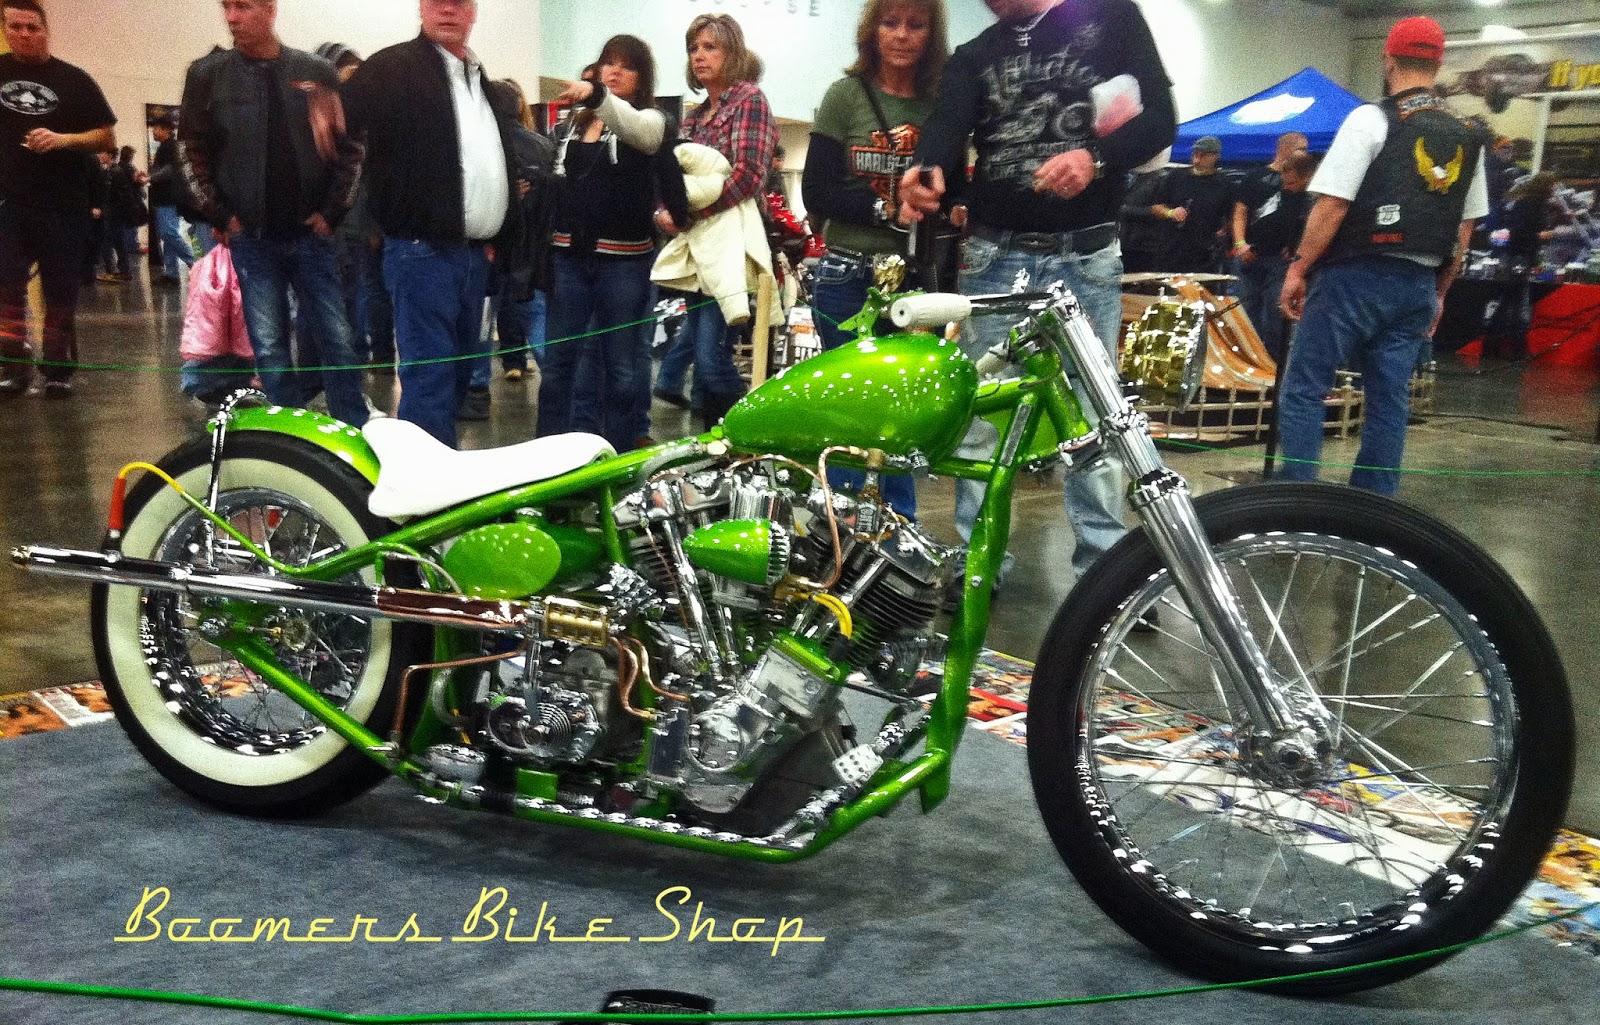 boomers bike shop easy rider bike show 2014. Black Bedroom Furniture Sets. Home Design Ideas